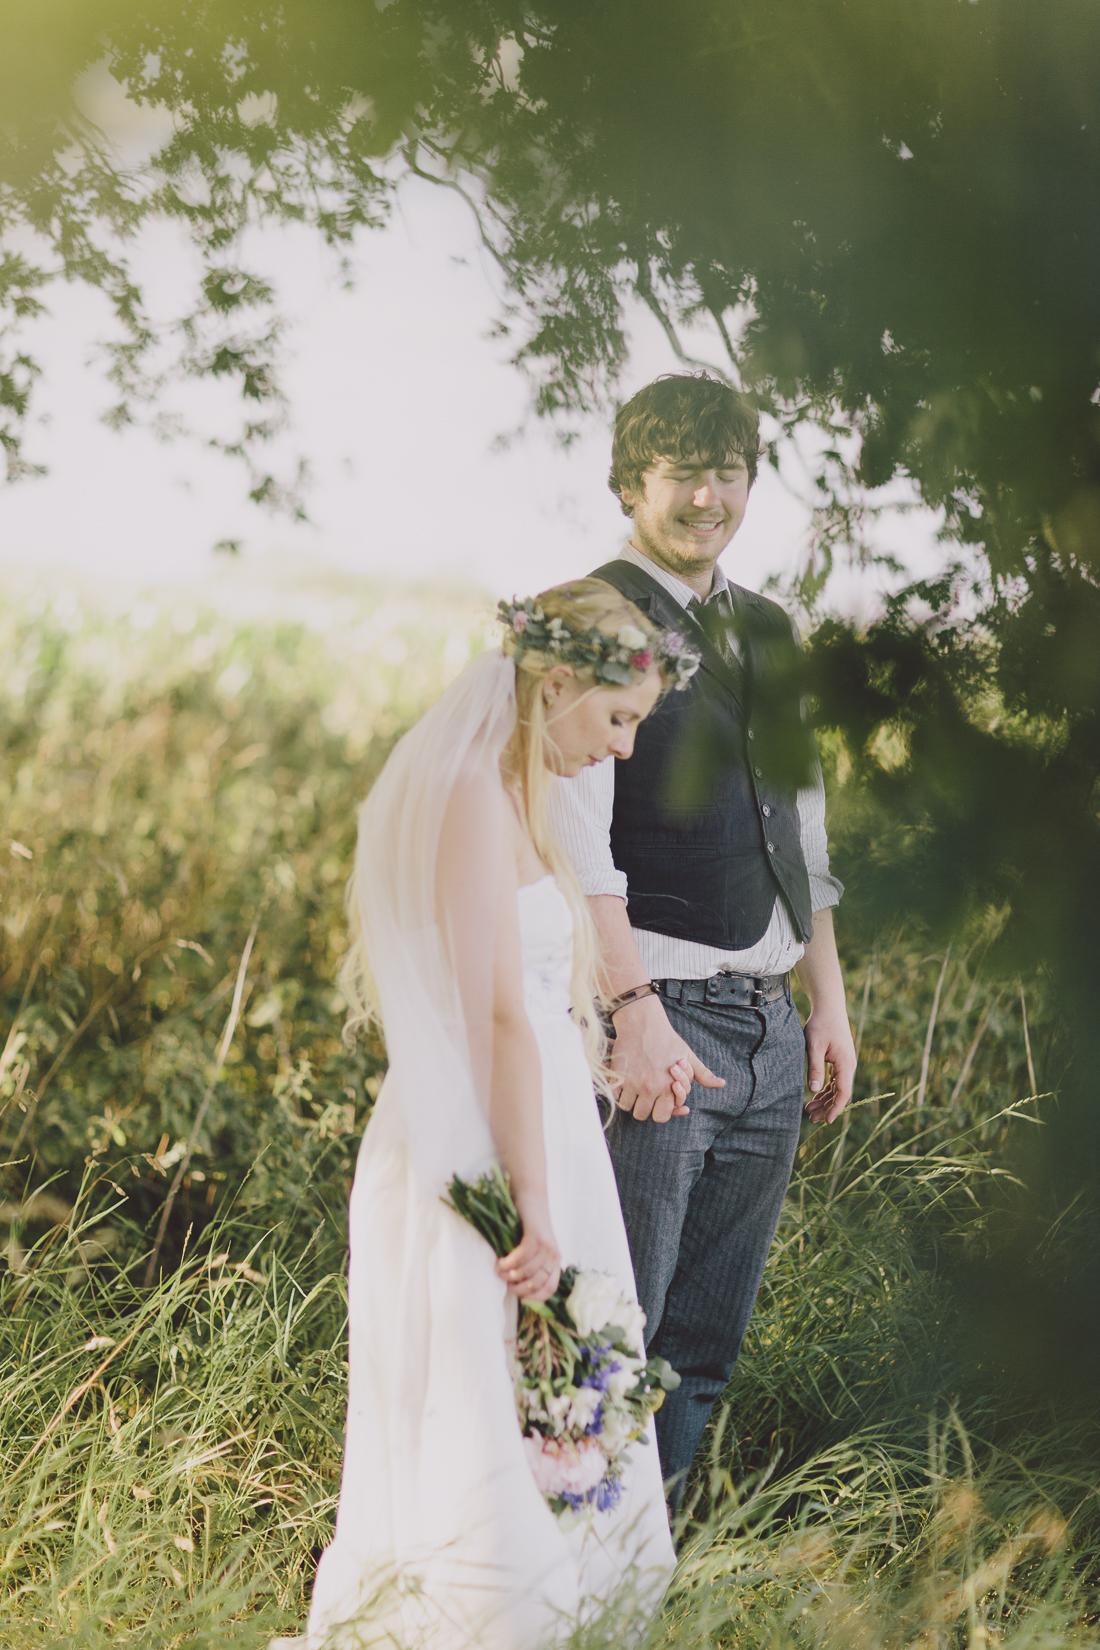 Flo + Ollie Tewkesbury Festival Wedding Scuffins Photography 116